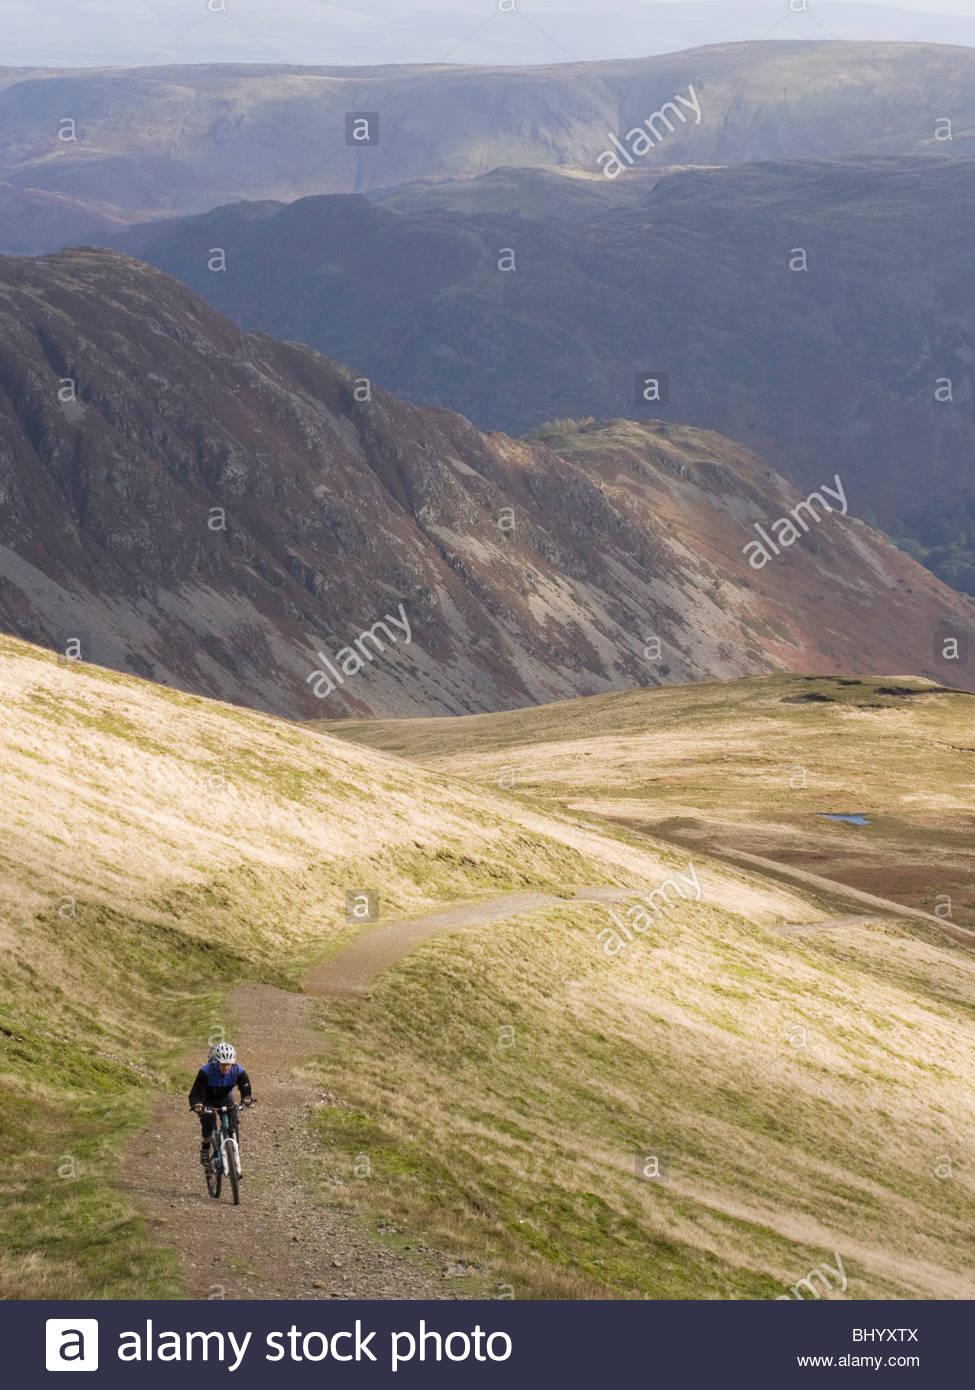 Mountain Biker climbing up a bridleway on Helvellyn, Cumbria. - Stock Image